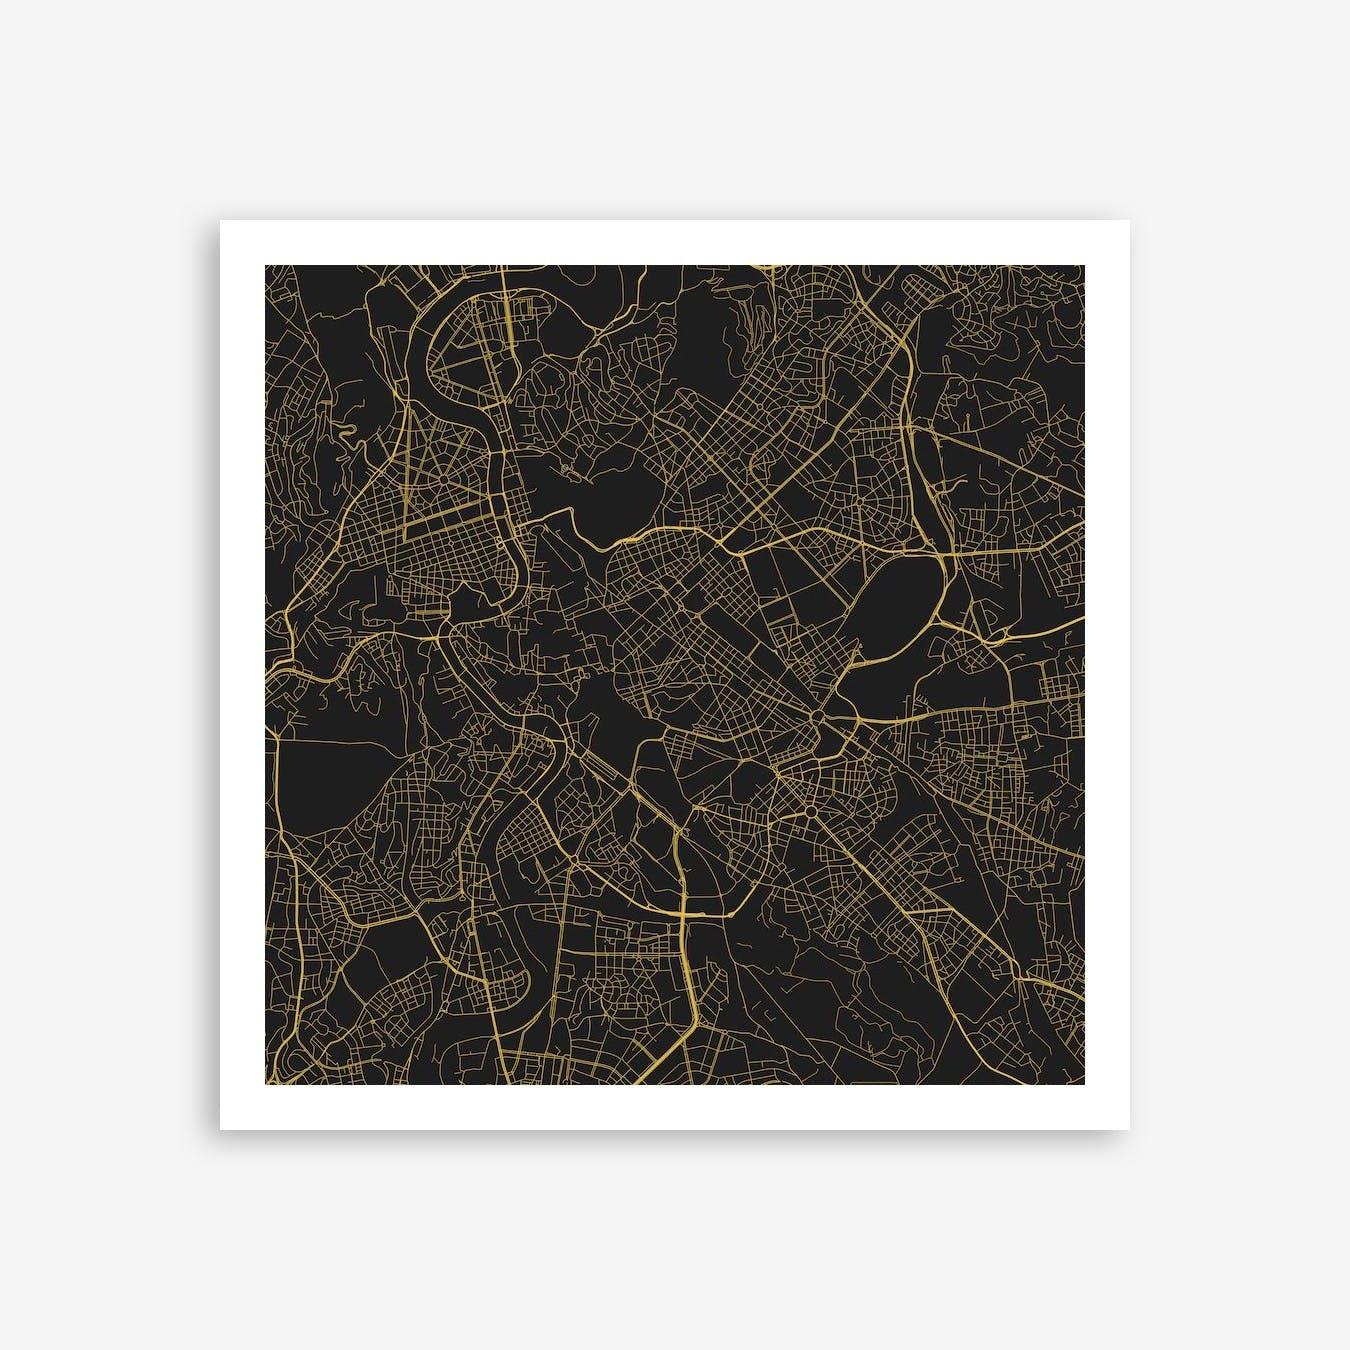 Rome in Yellow (Traffic)